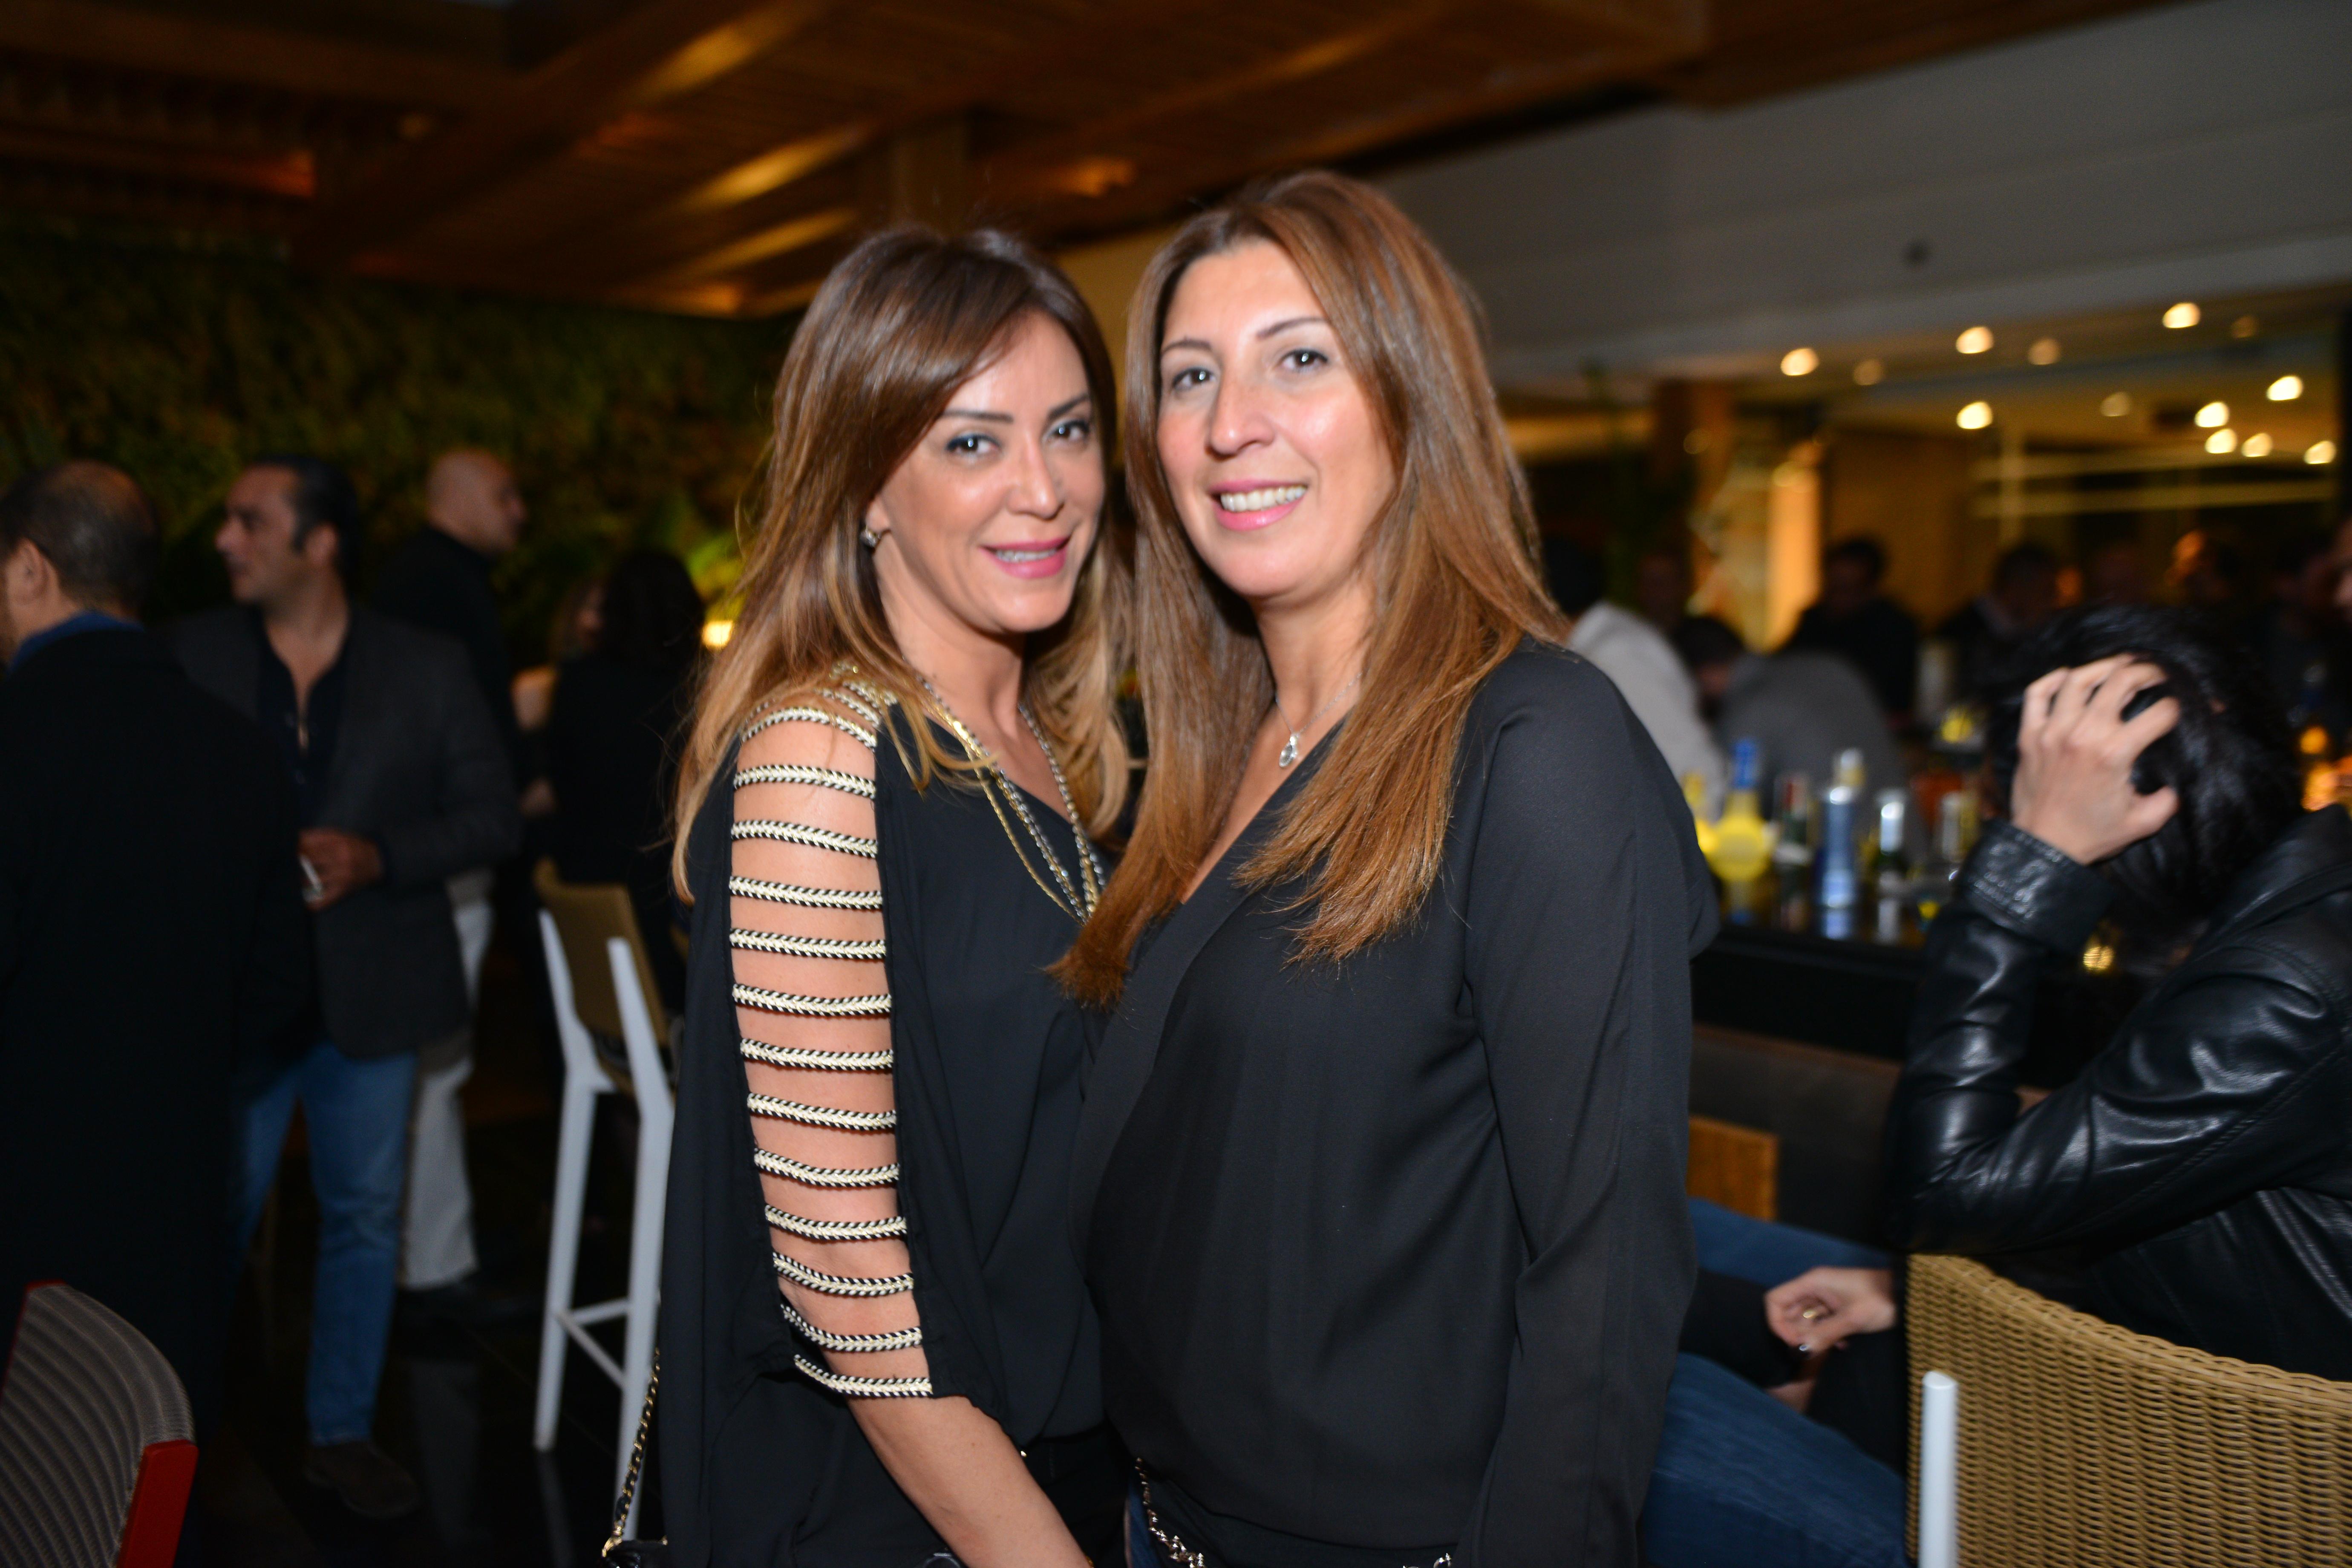 Ms. Noha Rashwan & Ms. Gigi El Zoghby